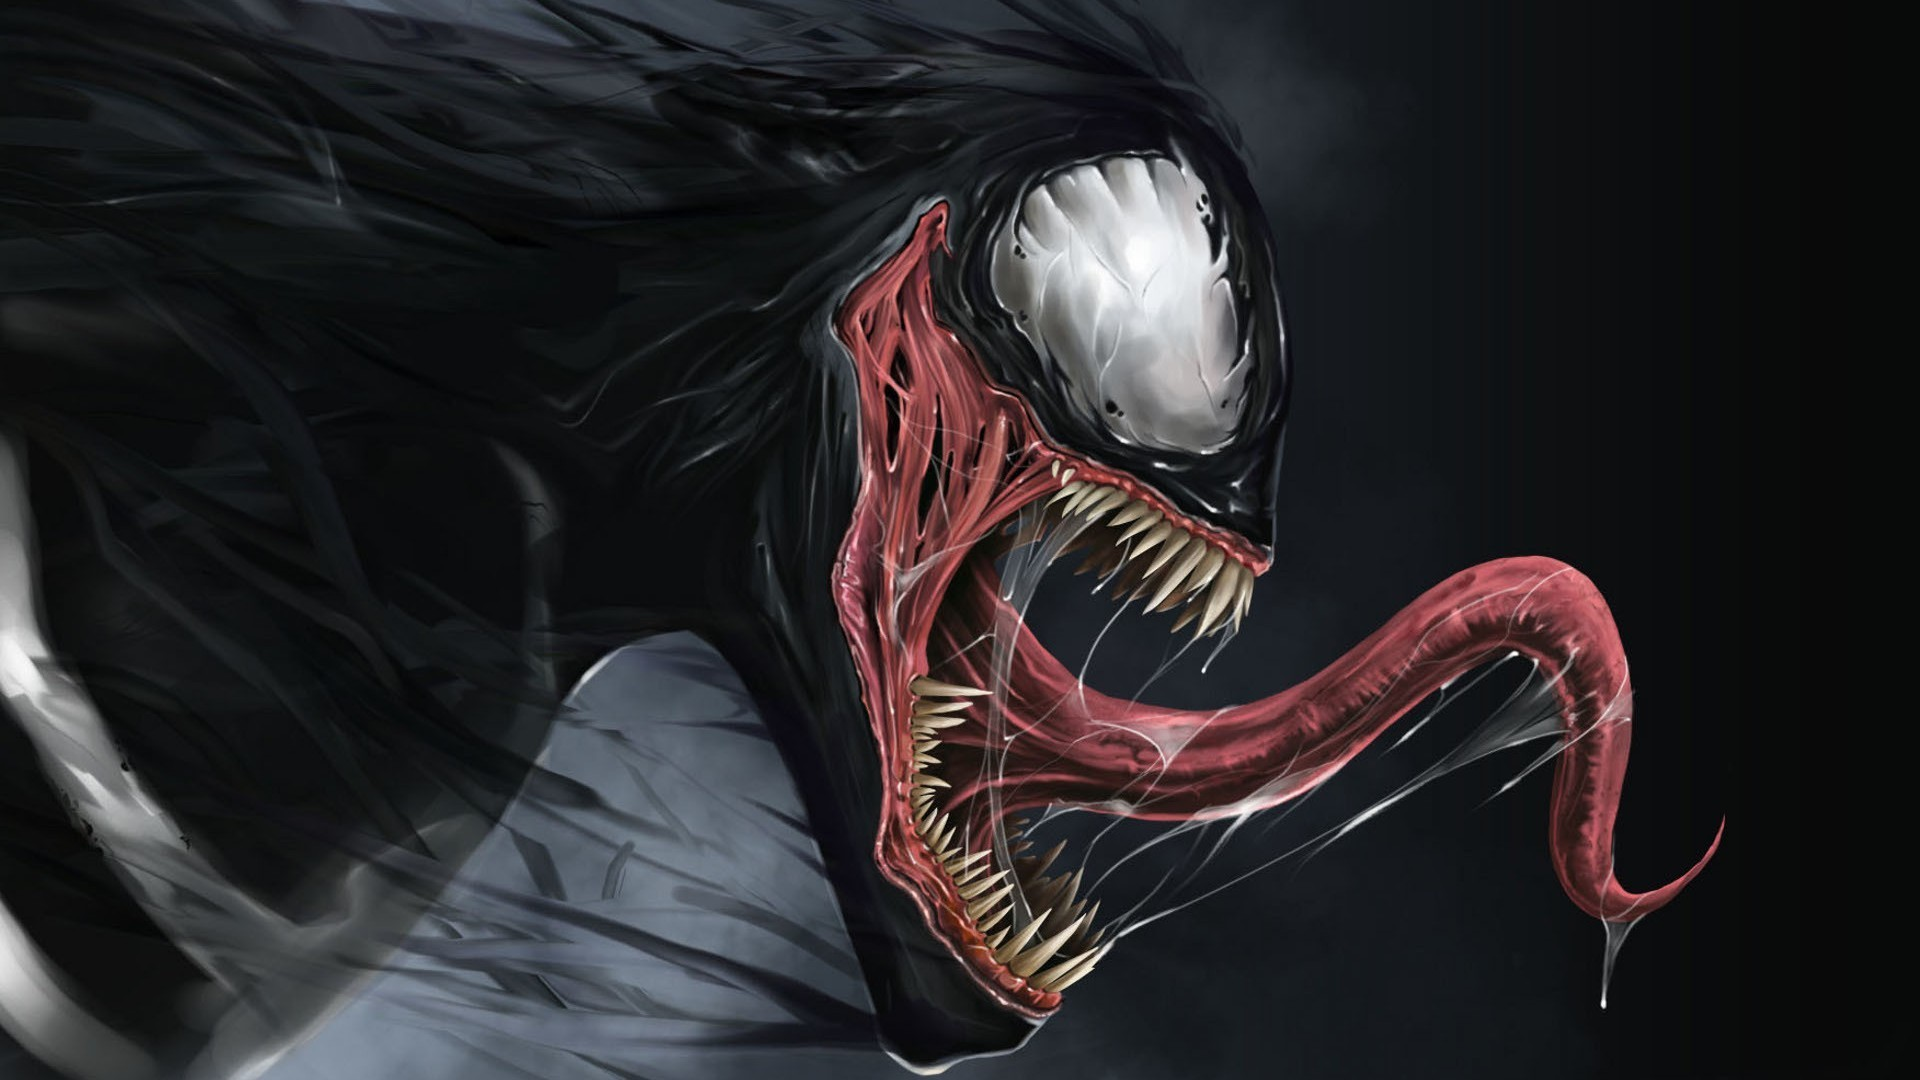 124 Venom Wallpaper Hd